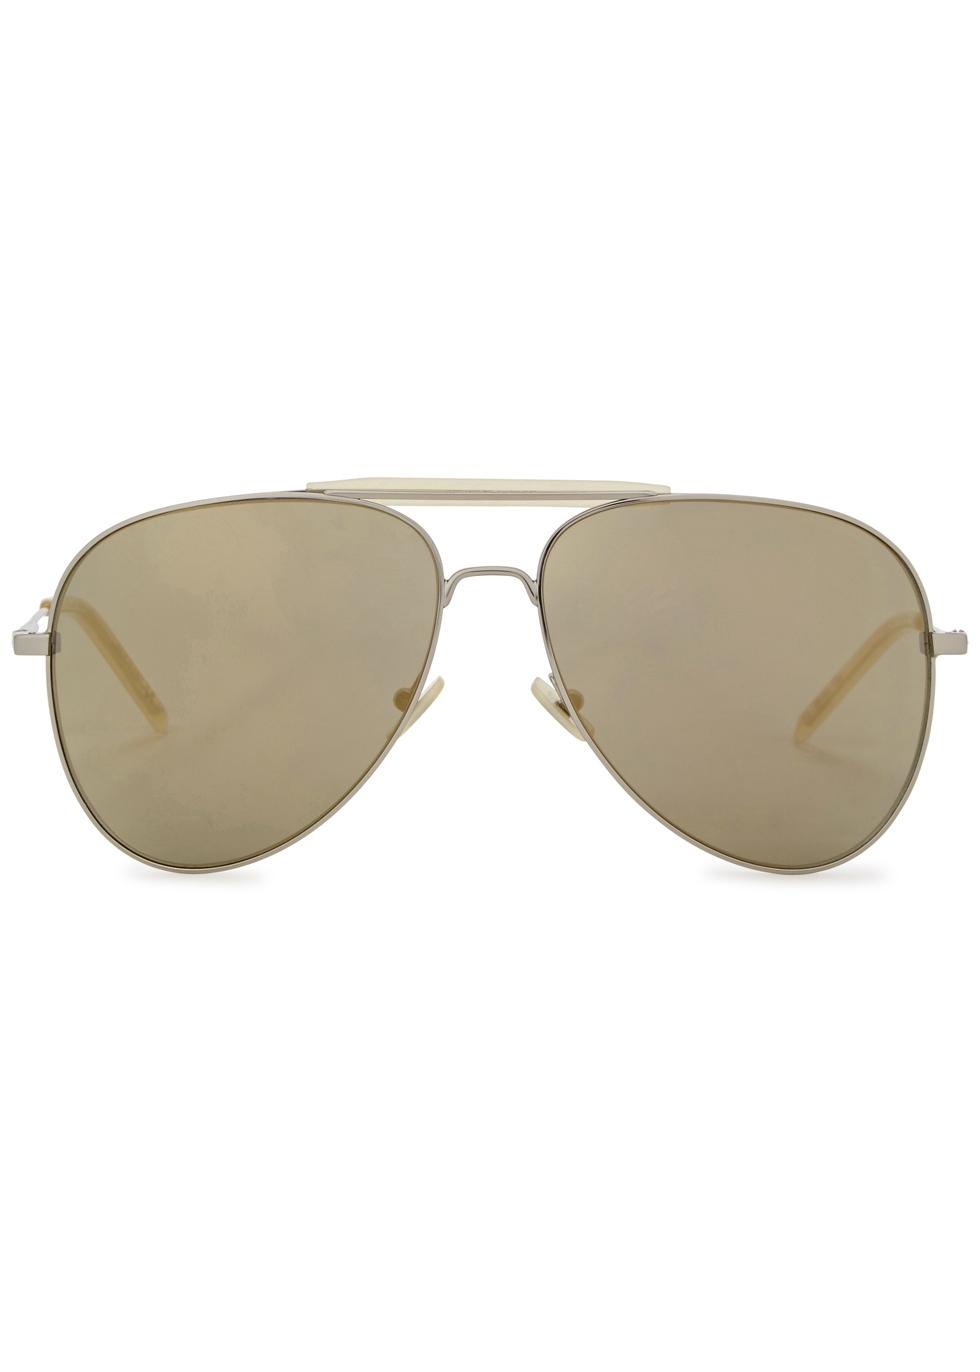 SL 85 silver tone aviator-style sunglasses - Saint Laurent